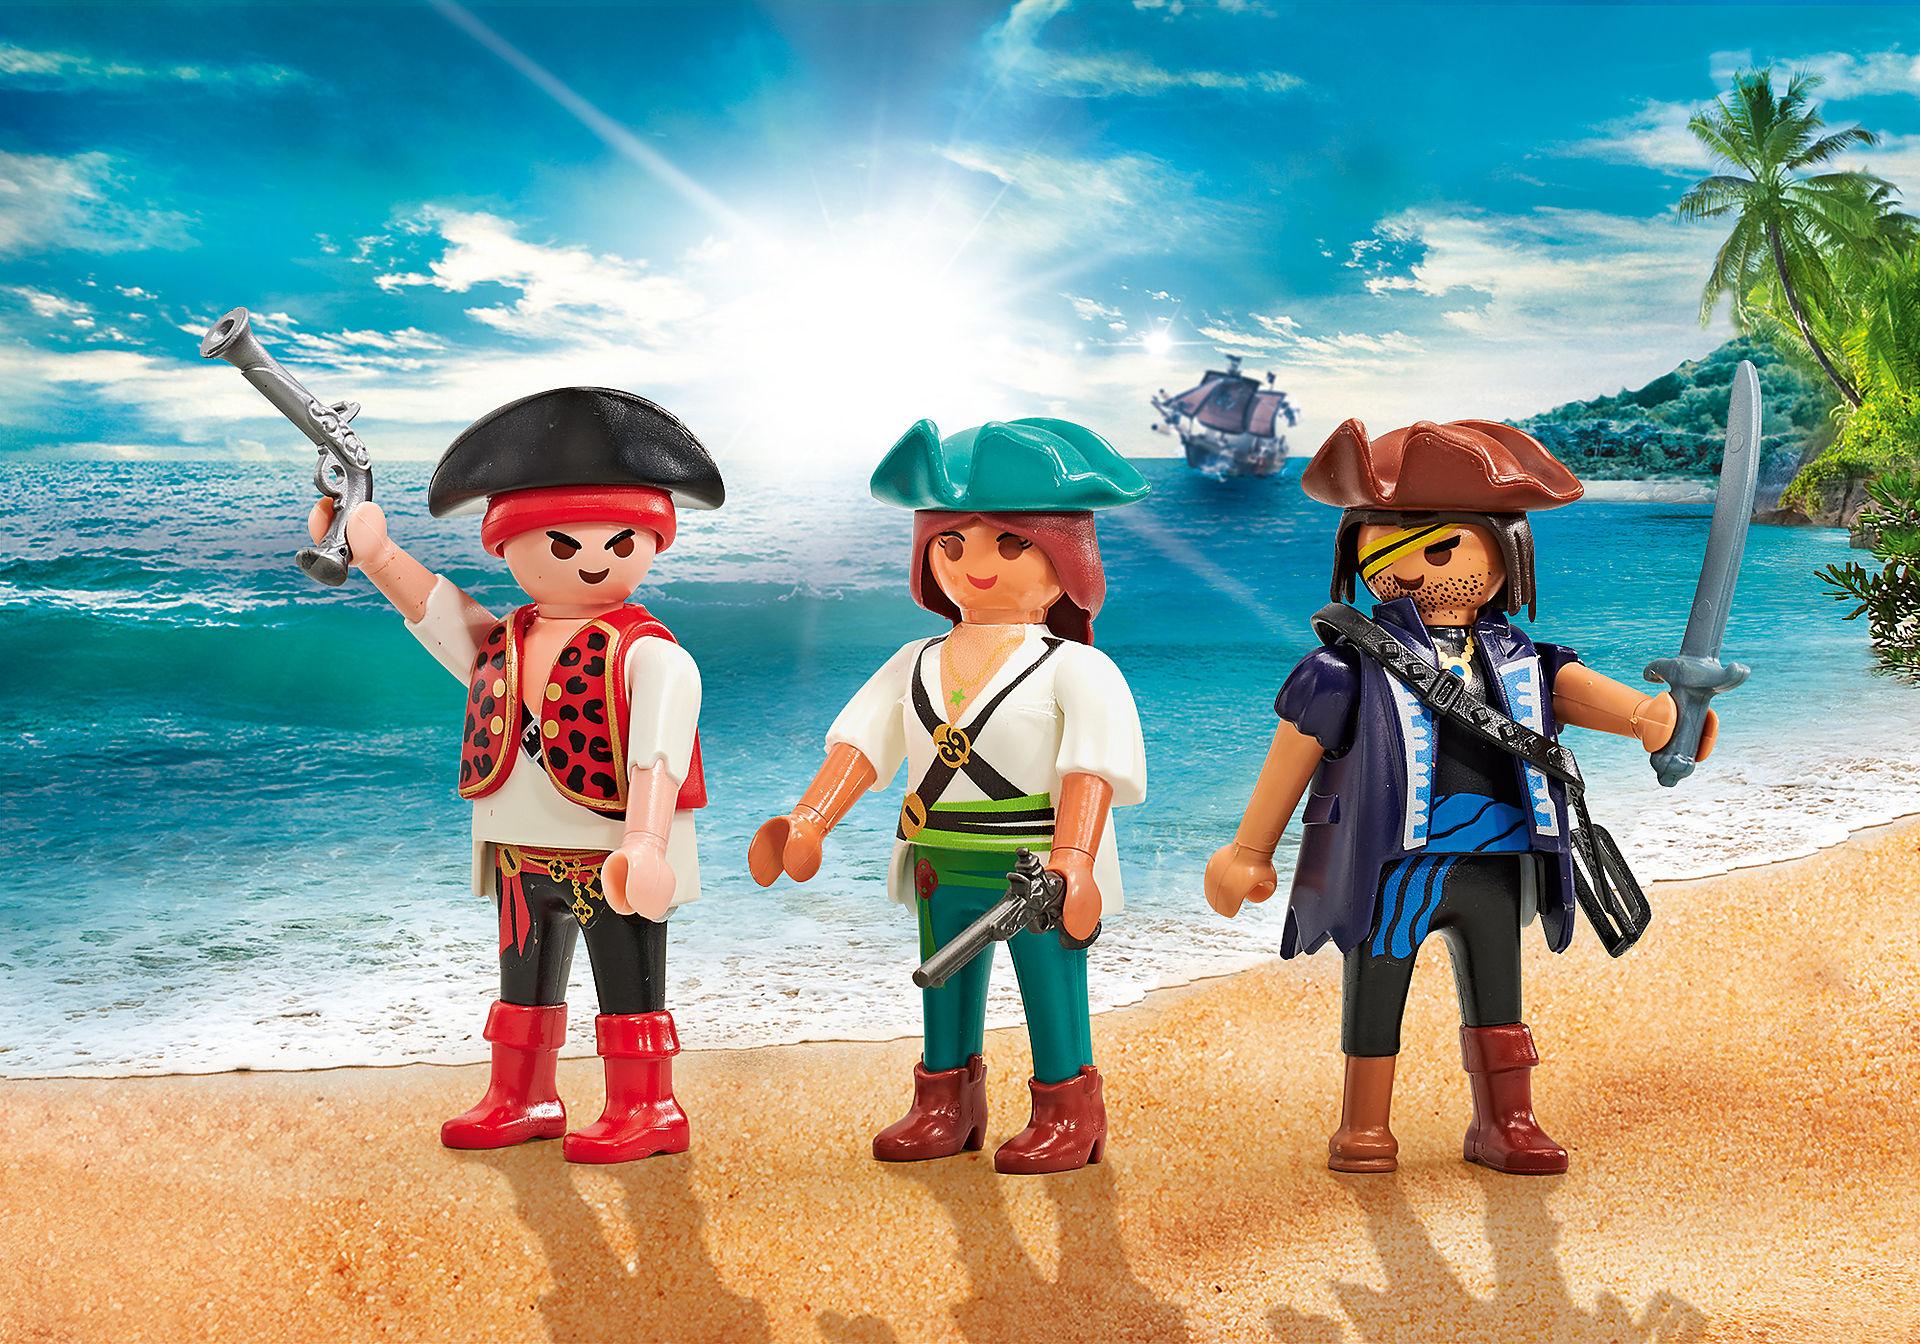 9884 Drei Piraten zoom image1